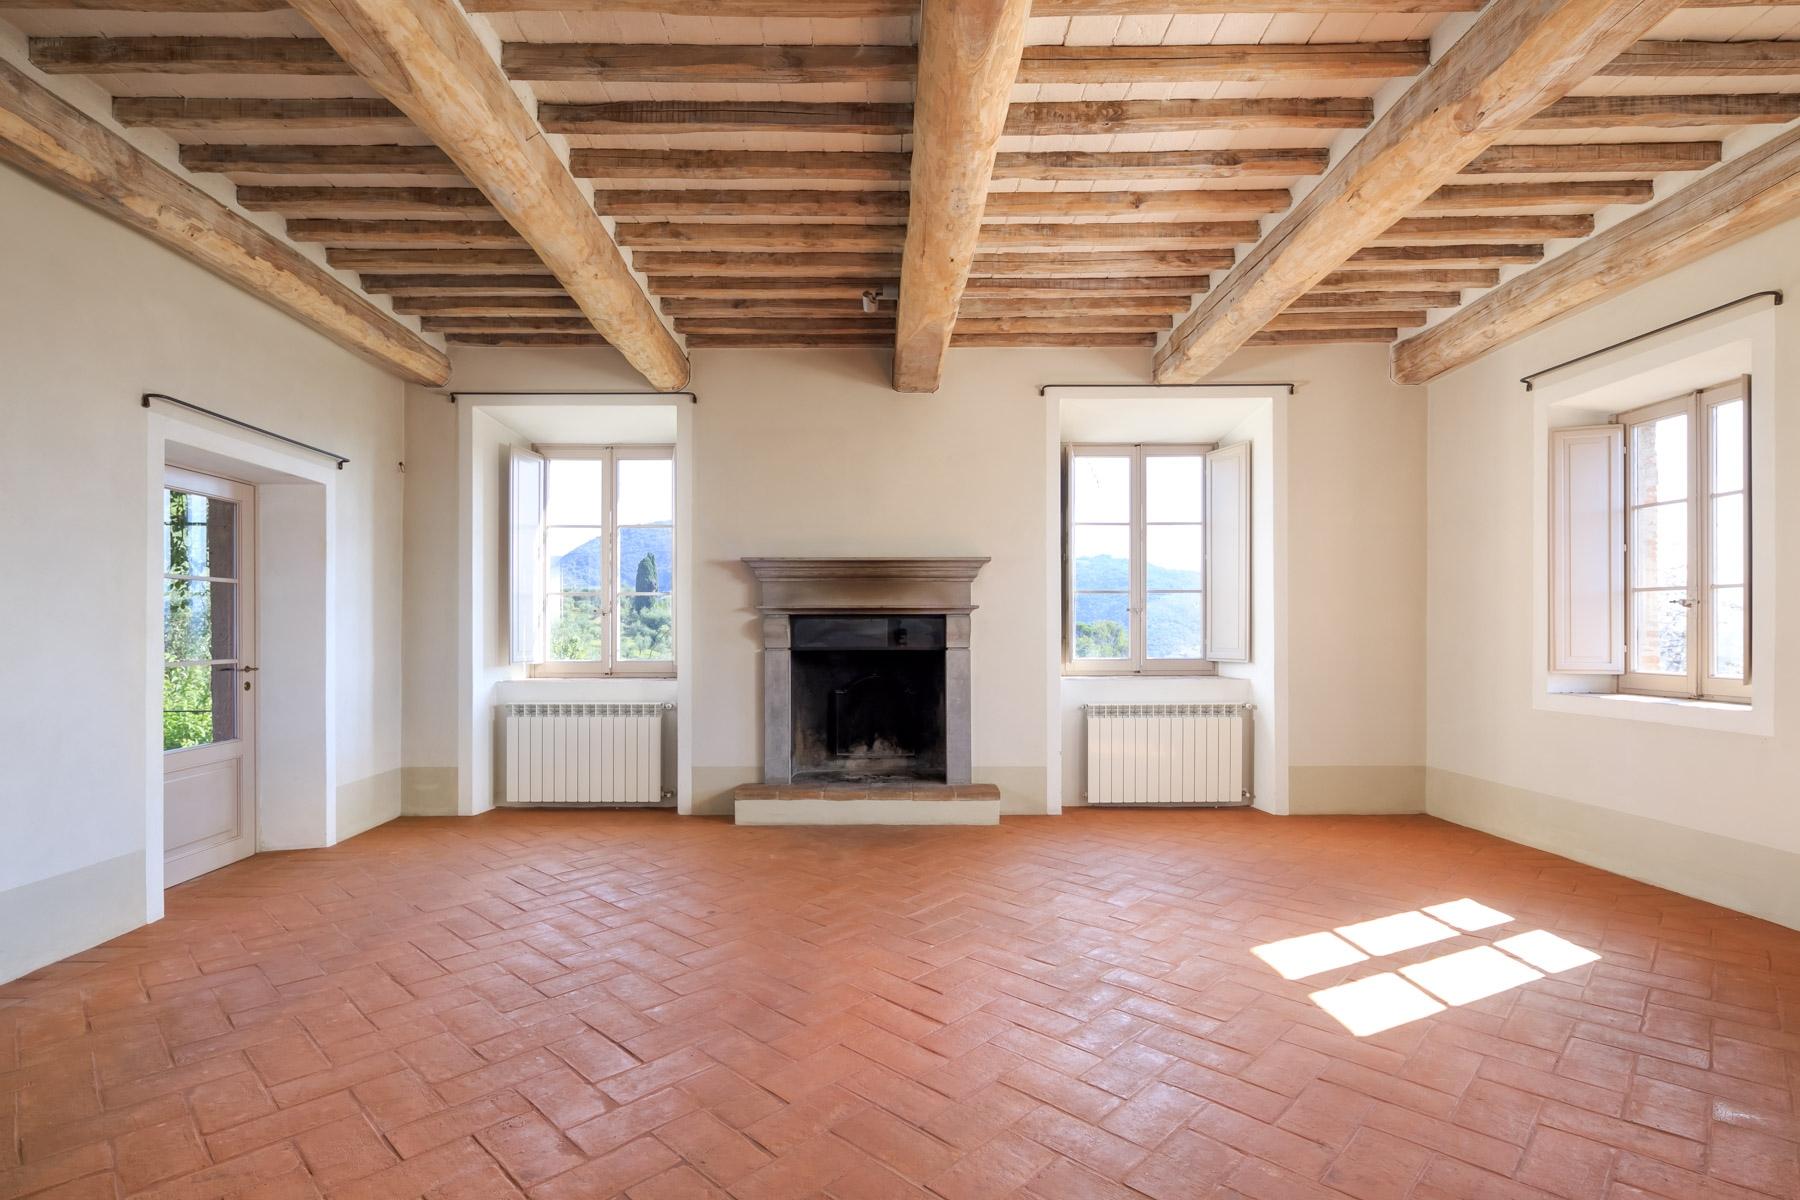 Villa in Vendita a Lucca: 5 locali, 225 mq - Foto 6